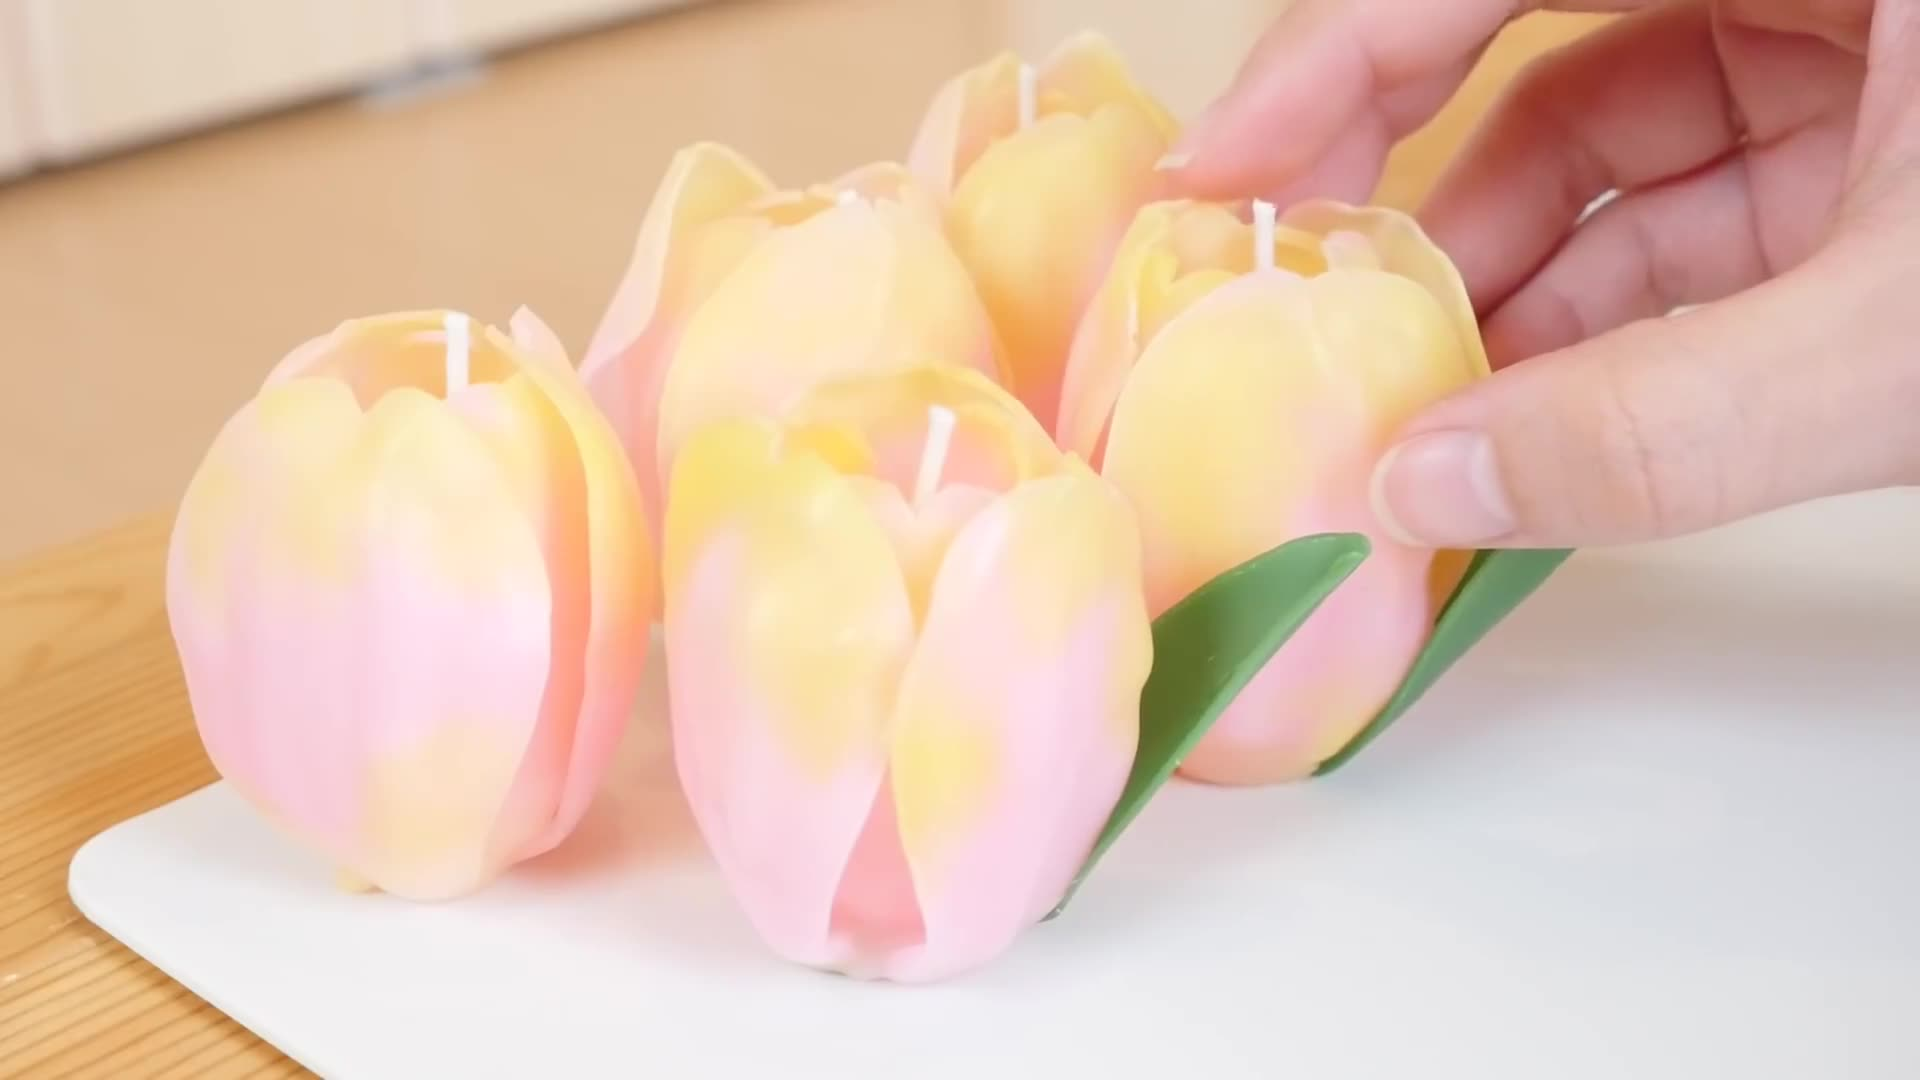 DIY粉色郁金香造型手工蜡烛 / diy craft tulips candle